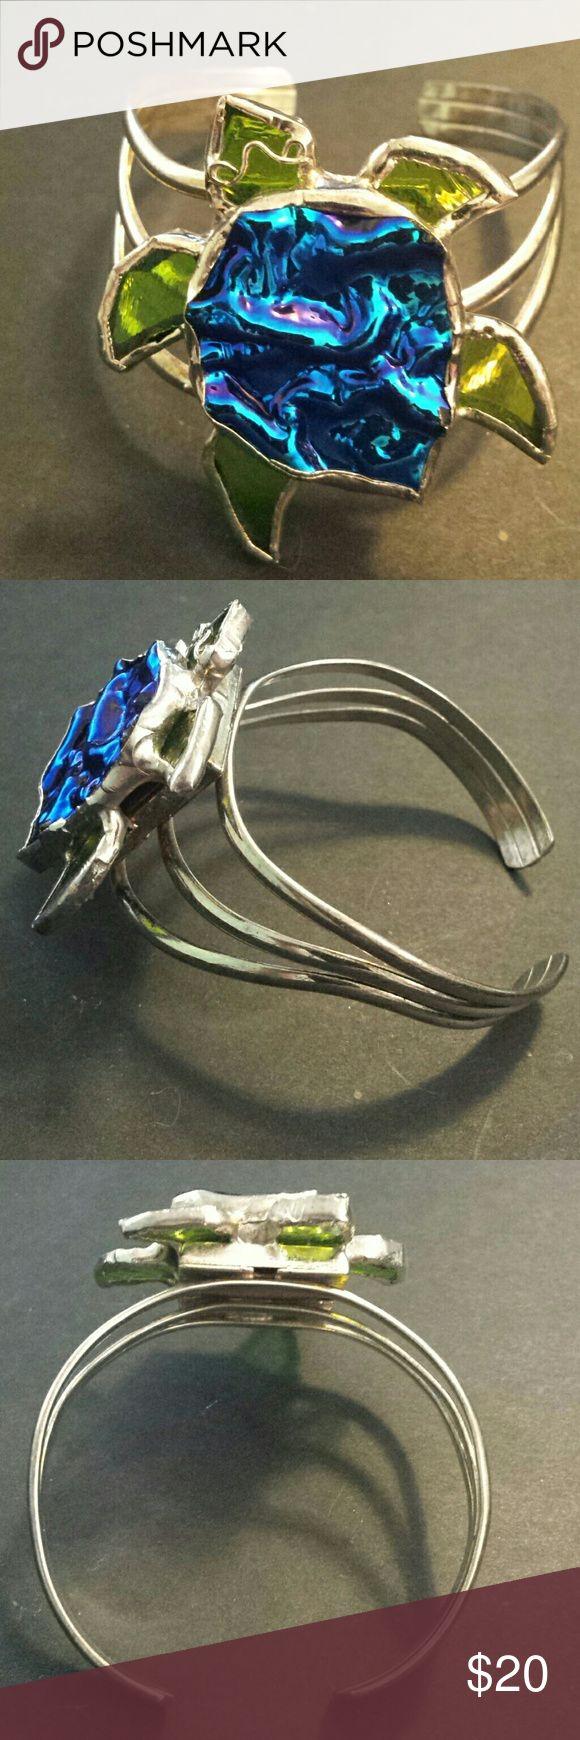 Small turtle cuff bracelet Small turtle cuff bracelet with dichroic glass center Jewelry Bracelets